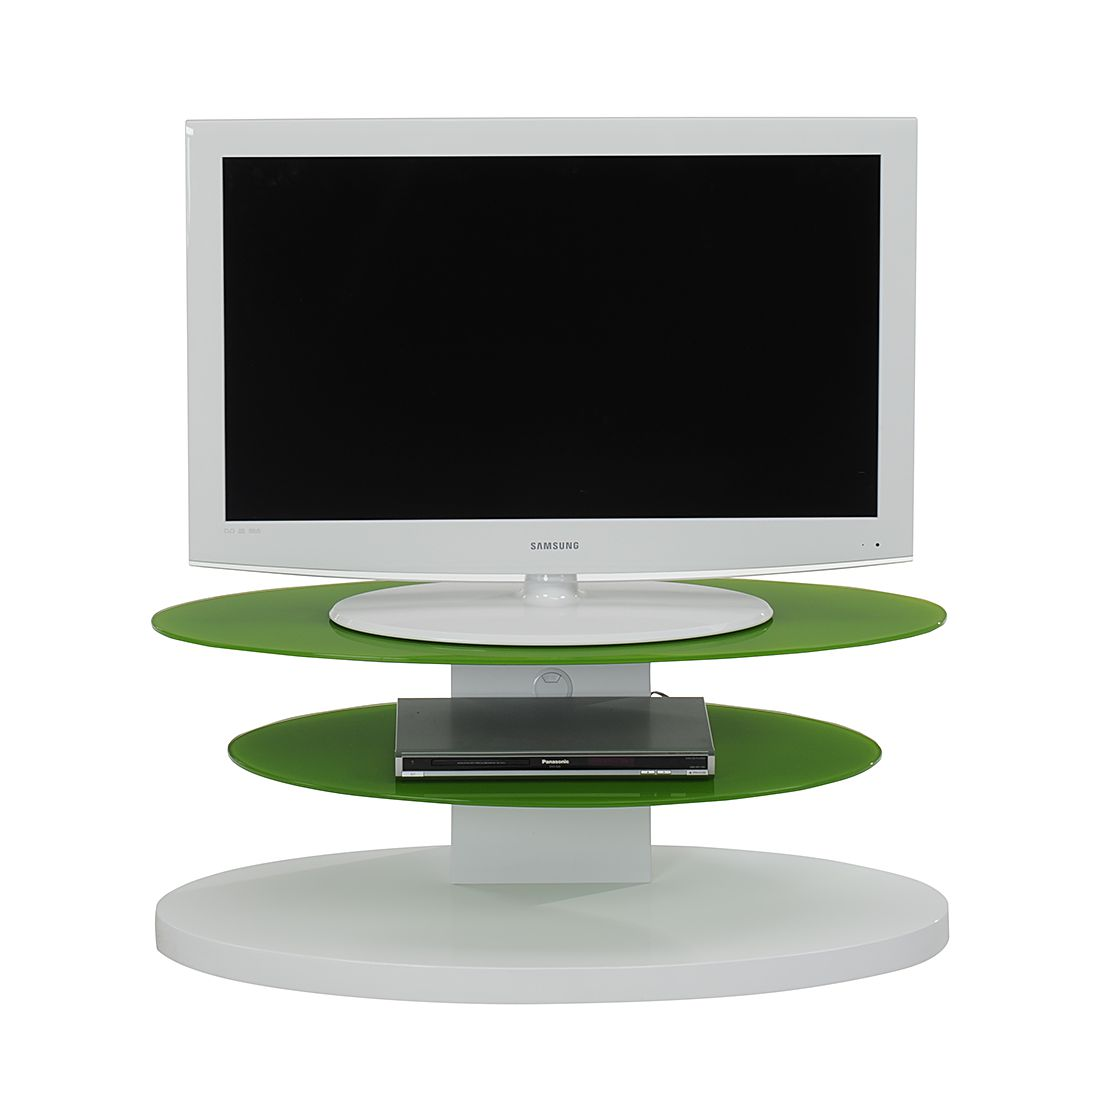 Tv Rack Cuuba Mojo 300 Hochglanz Weißglas Grün Elliptische Form